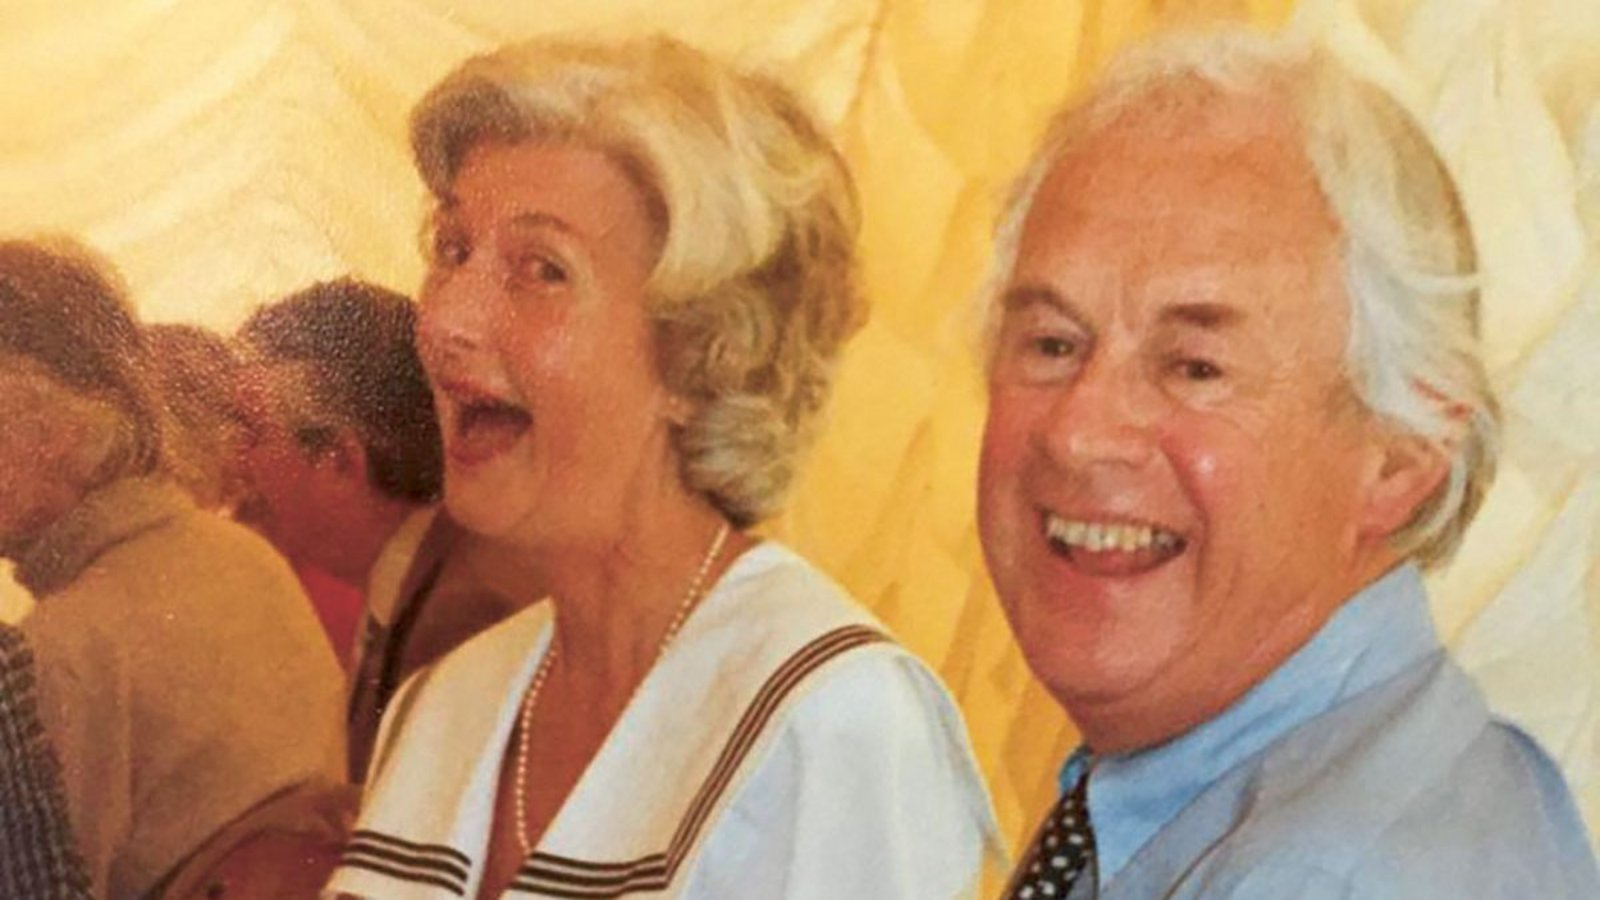 Gordon Frederick Taylor with his wife Barbara Newick, fashion designer.